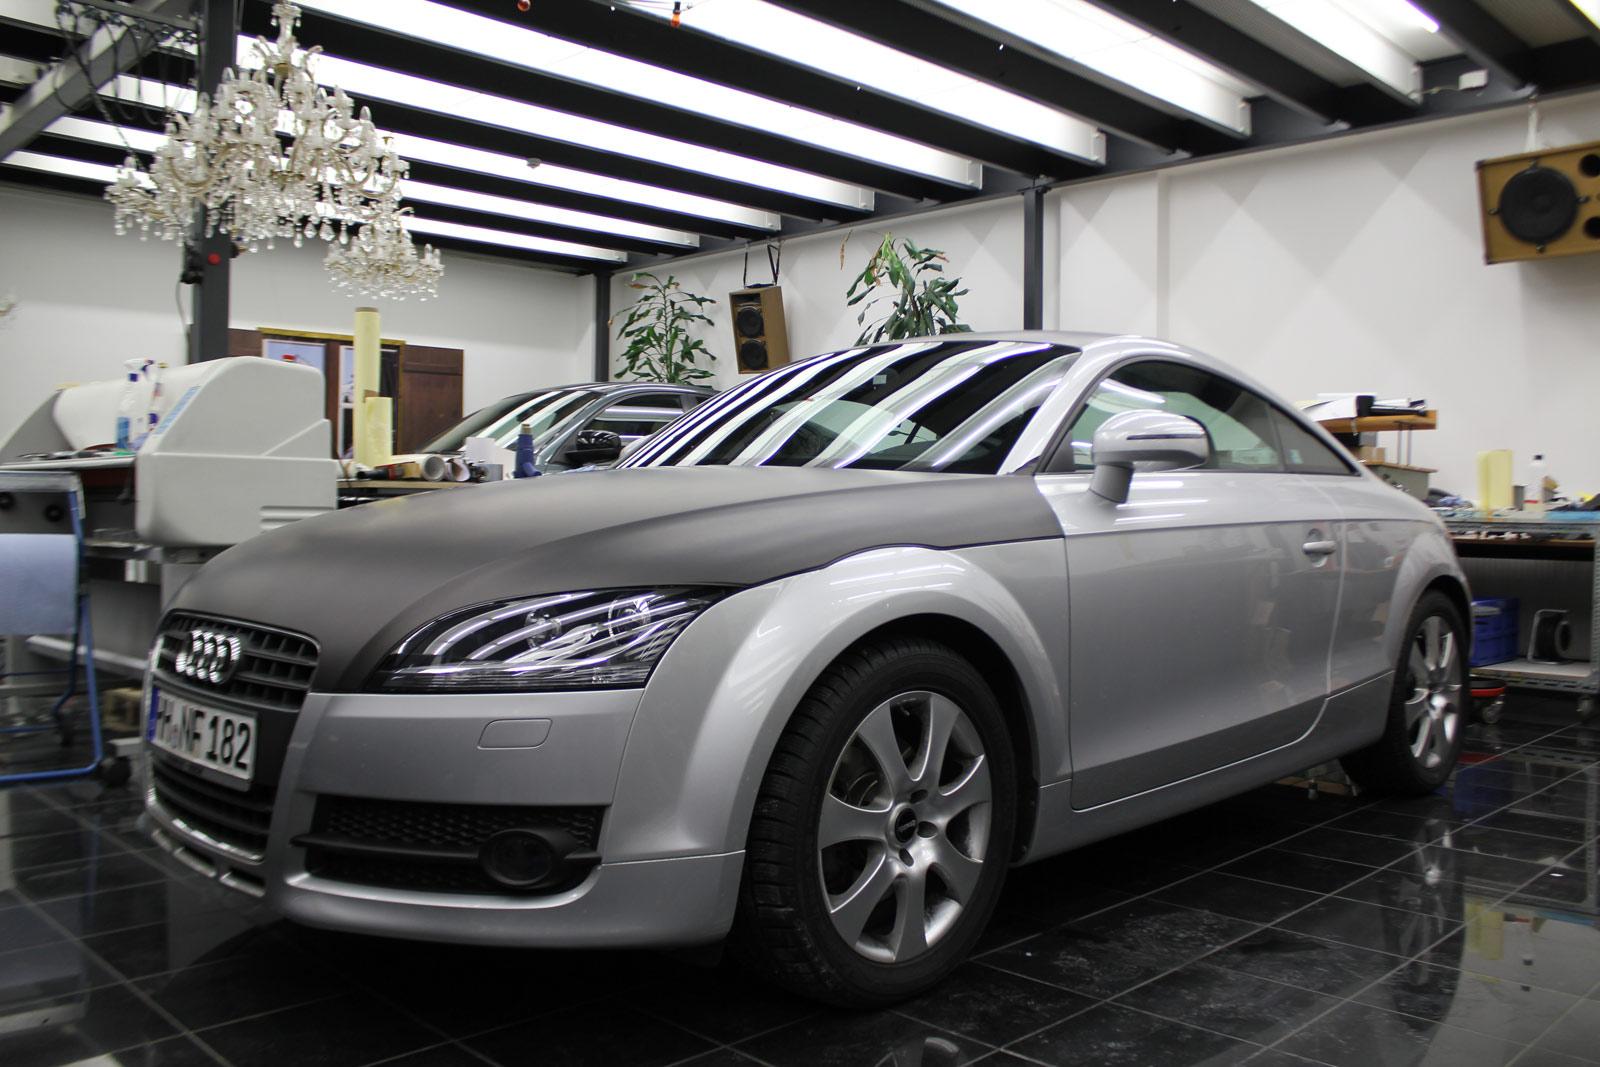 Audi_TT_Braun_Matt_Metallic_Branding_19